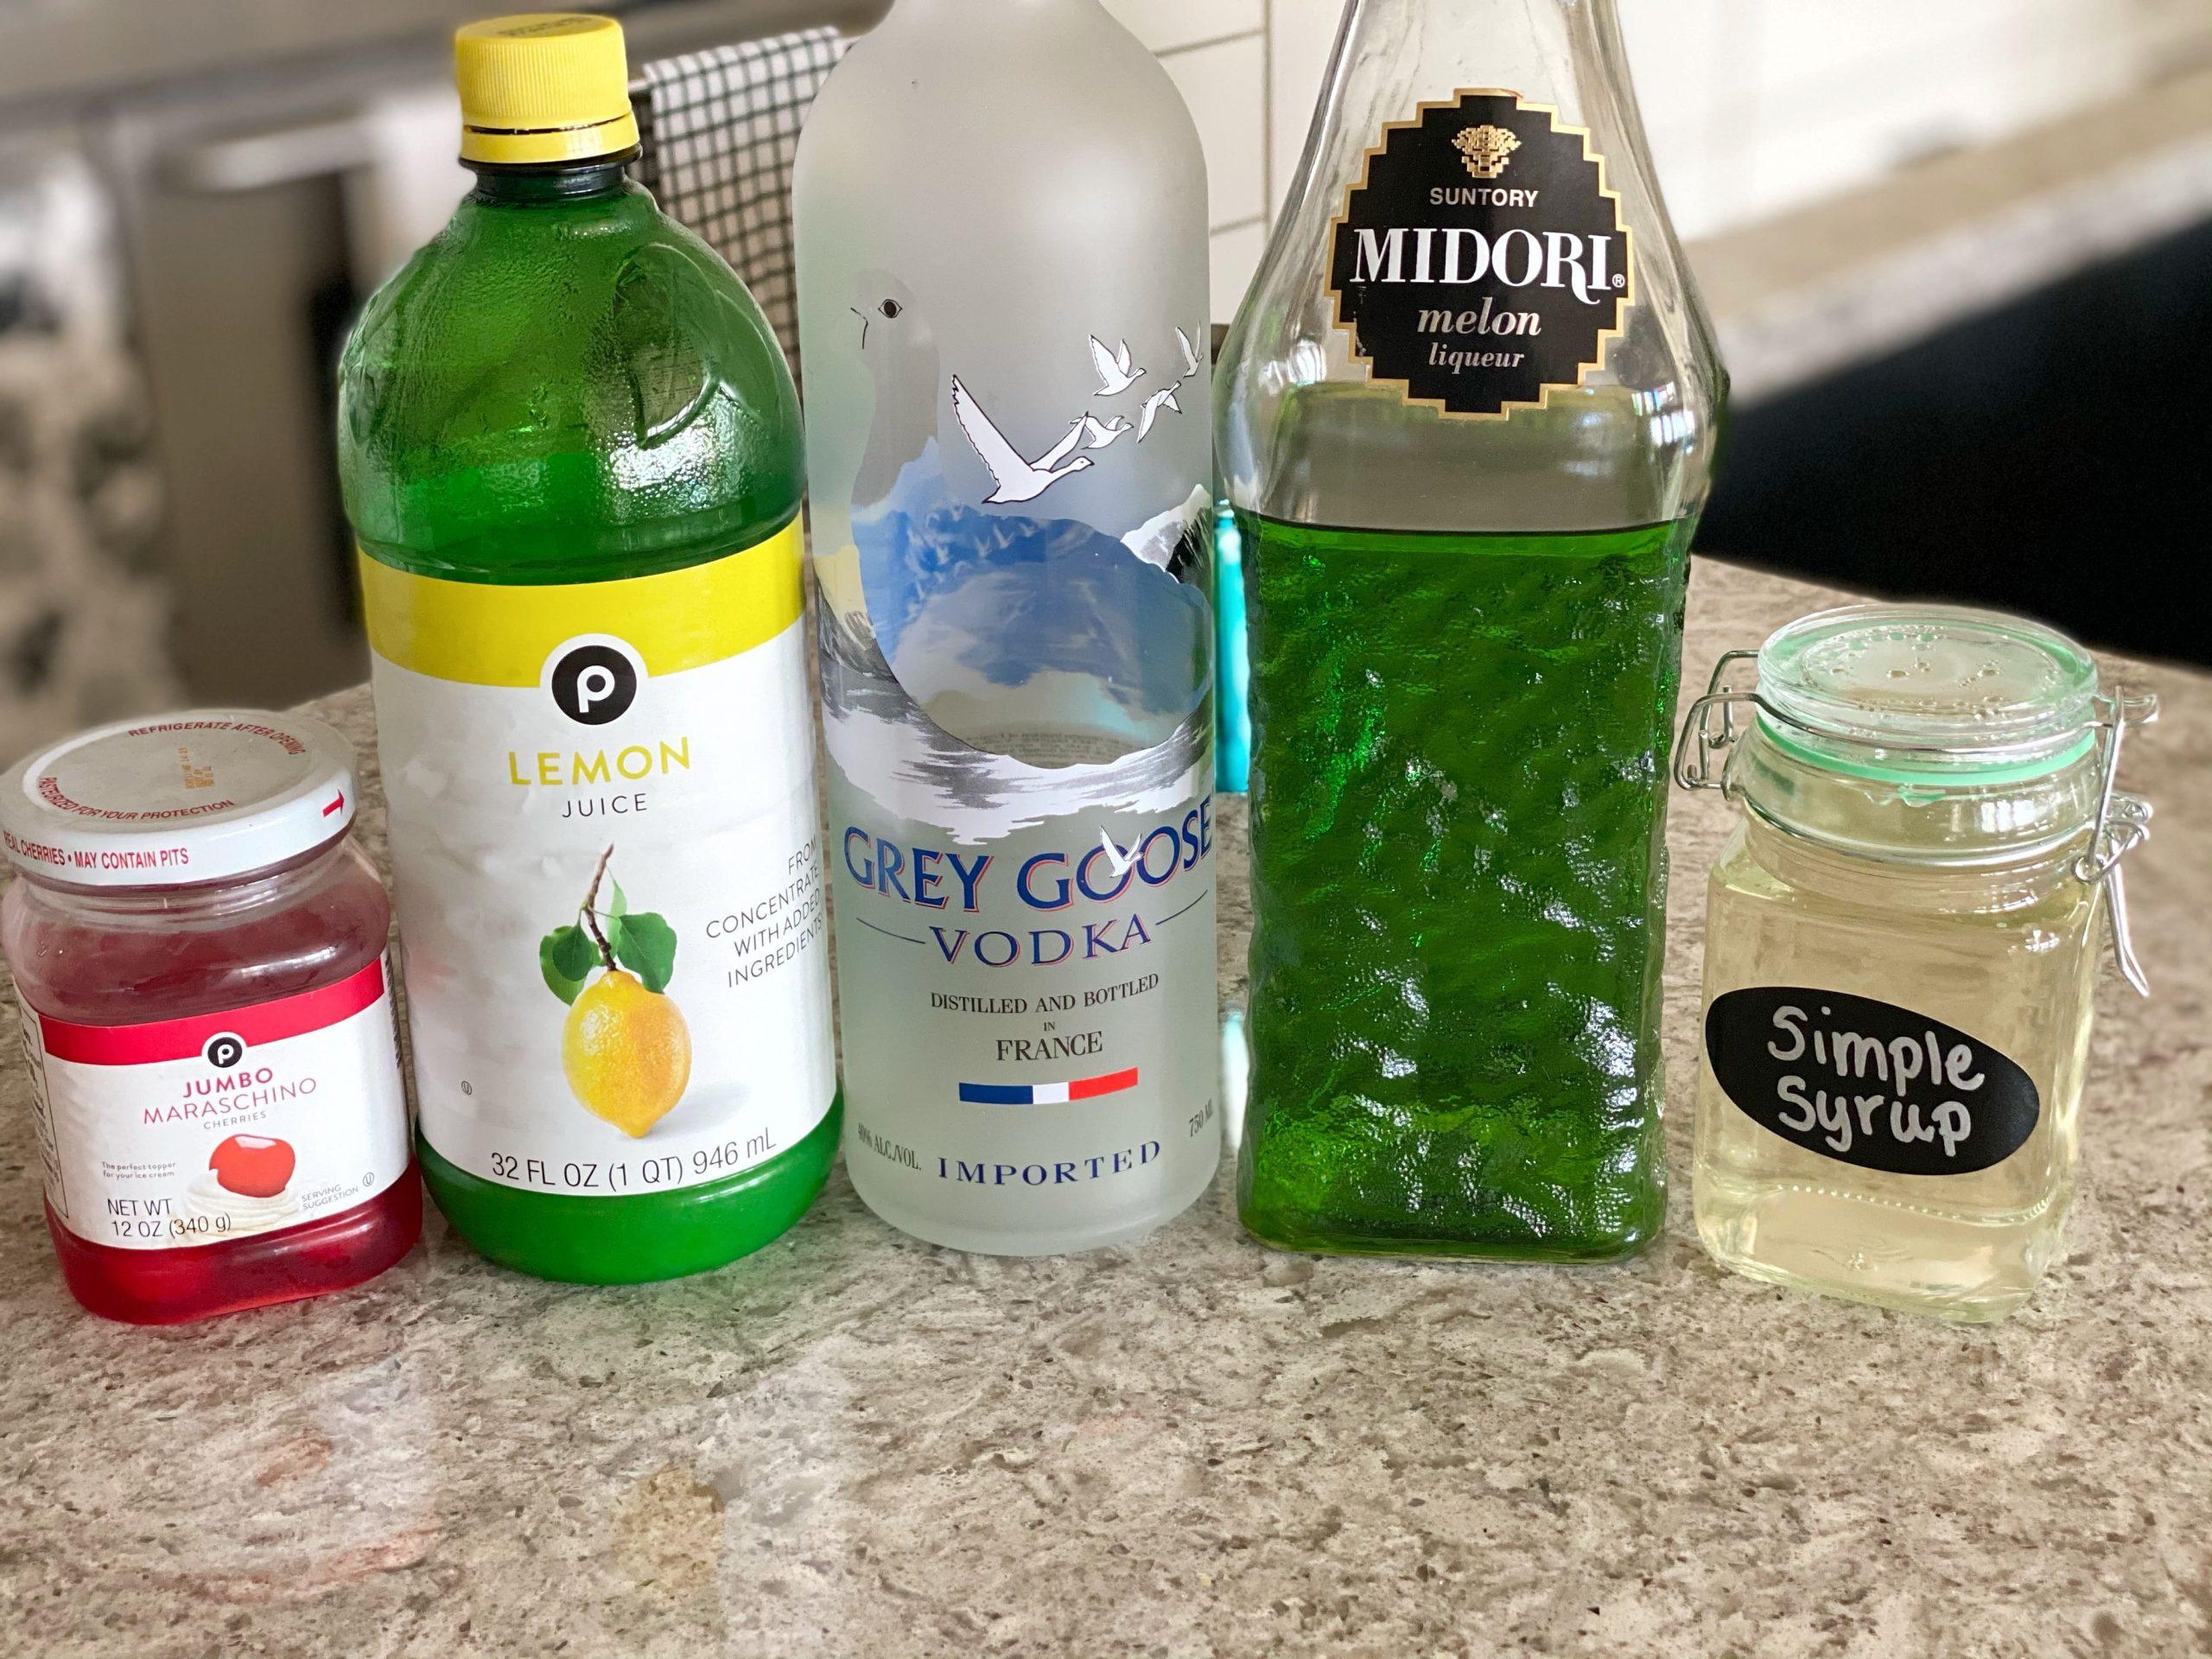 ingredients for Midori Martini